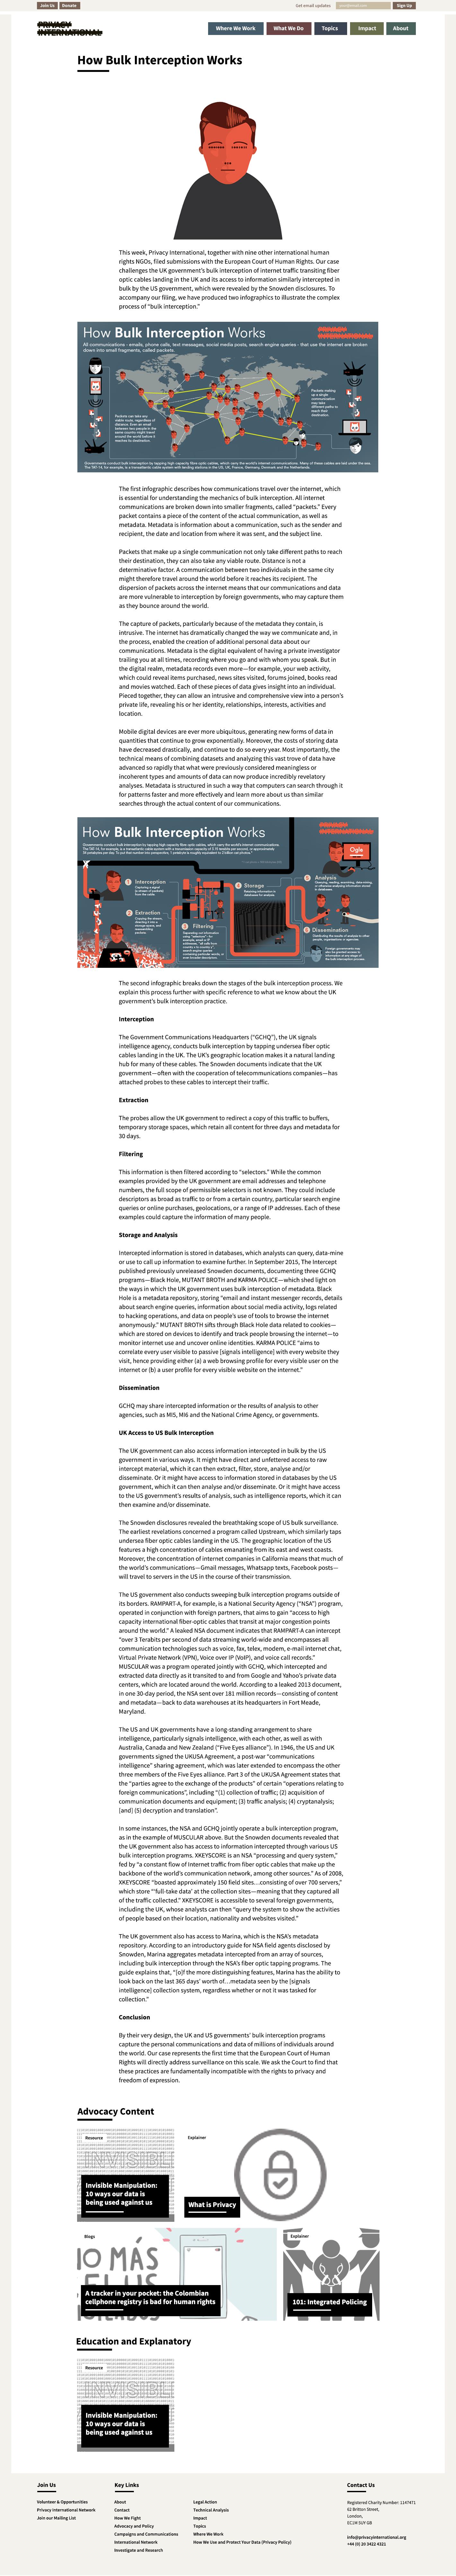 Kcoryprivacyinternationalfeature